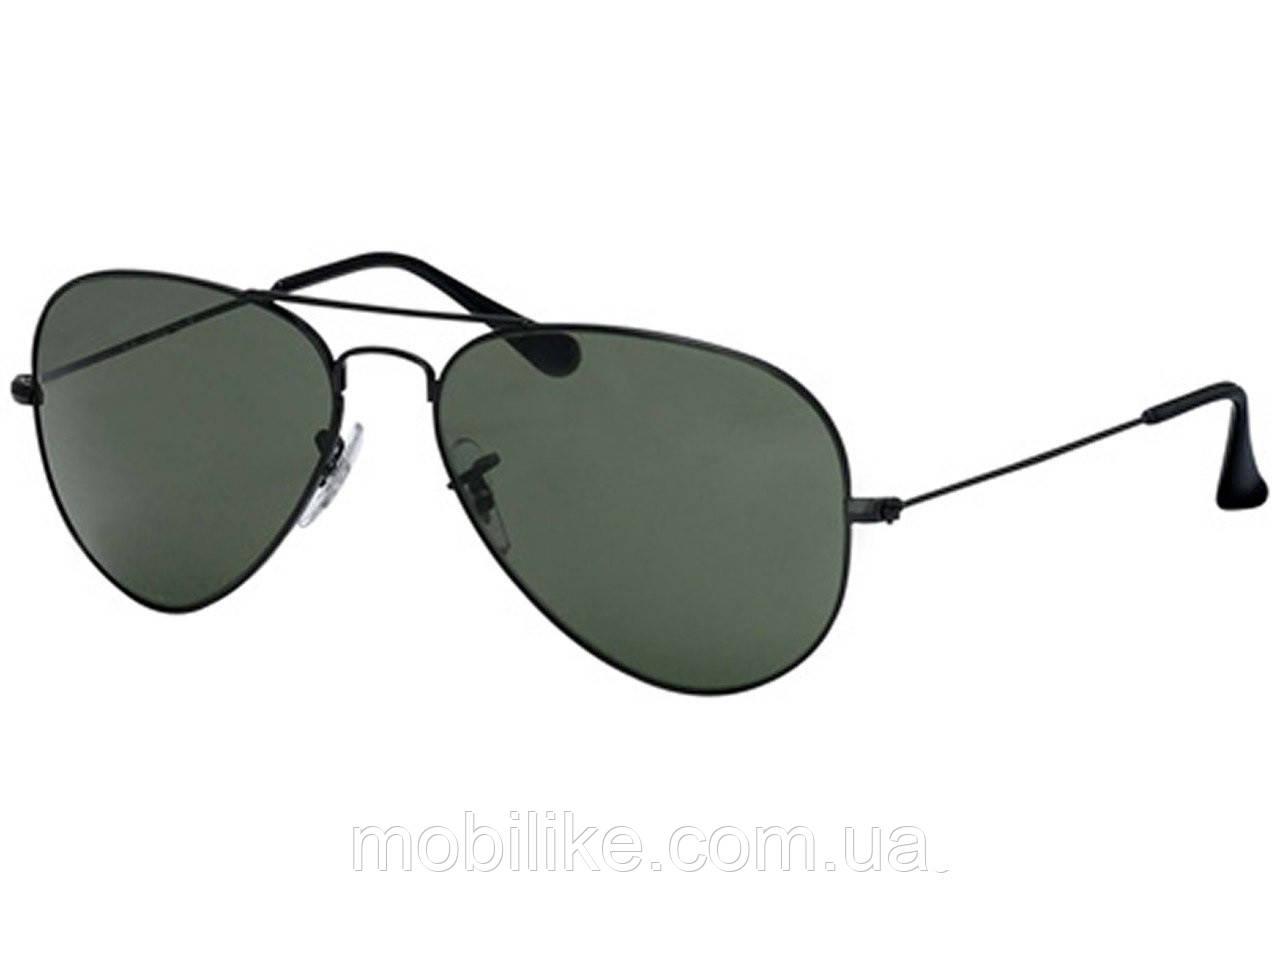 Солнцезащитные очки Ray Ban Aviator (Black Classic)(КОПИЯ)